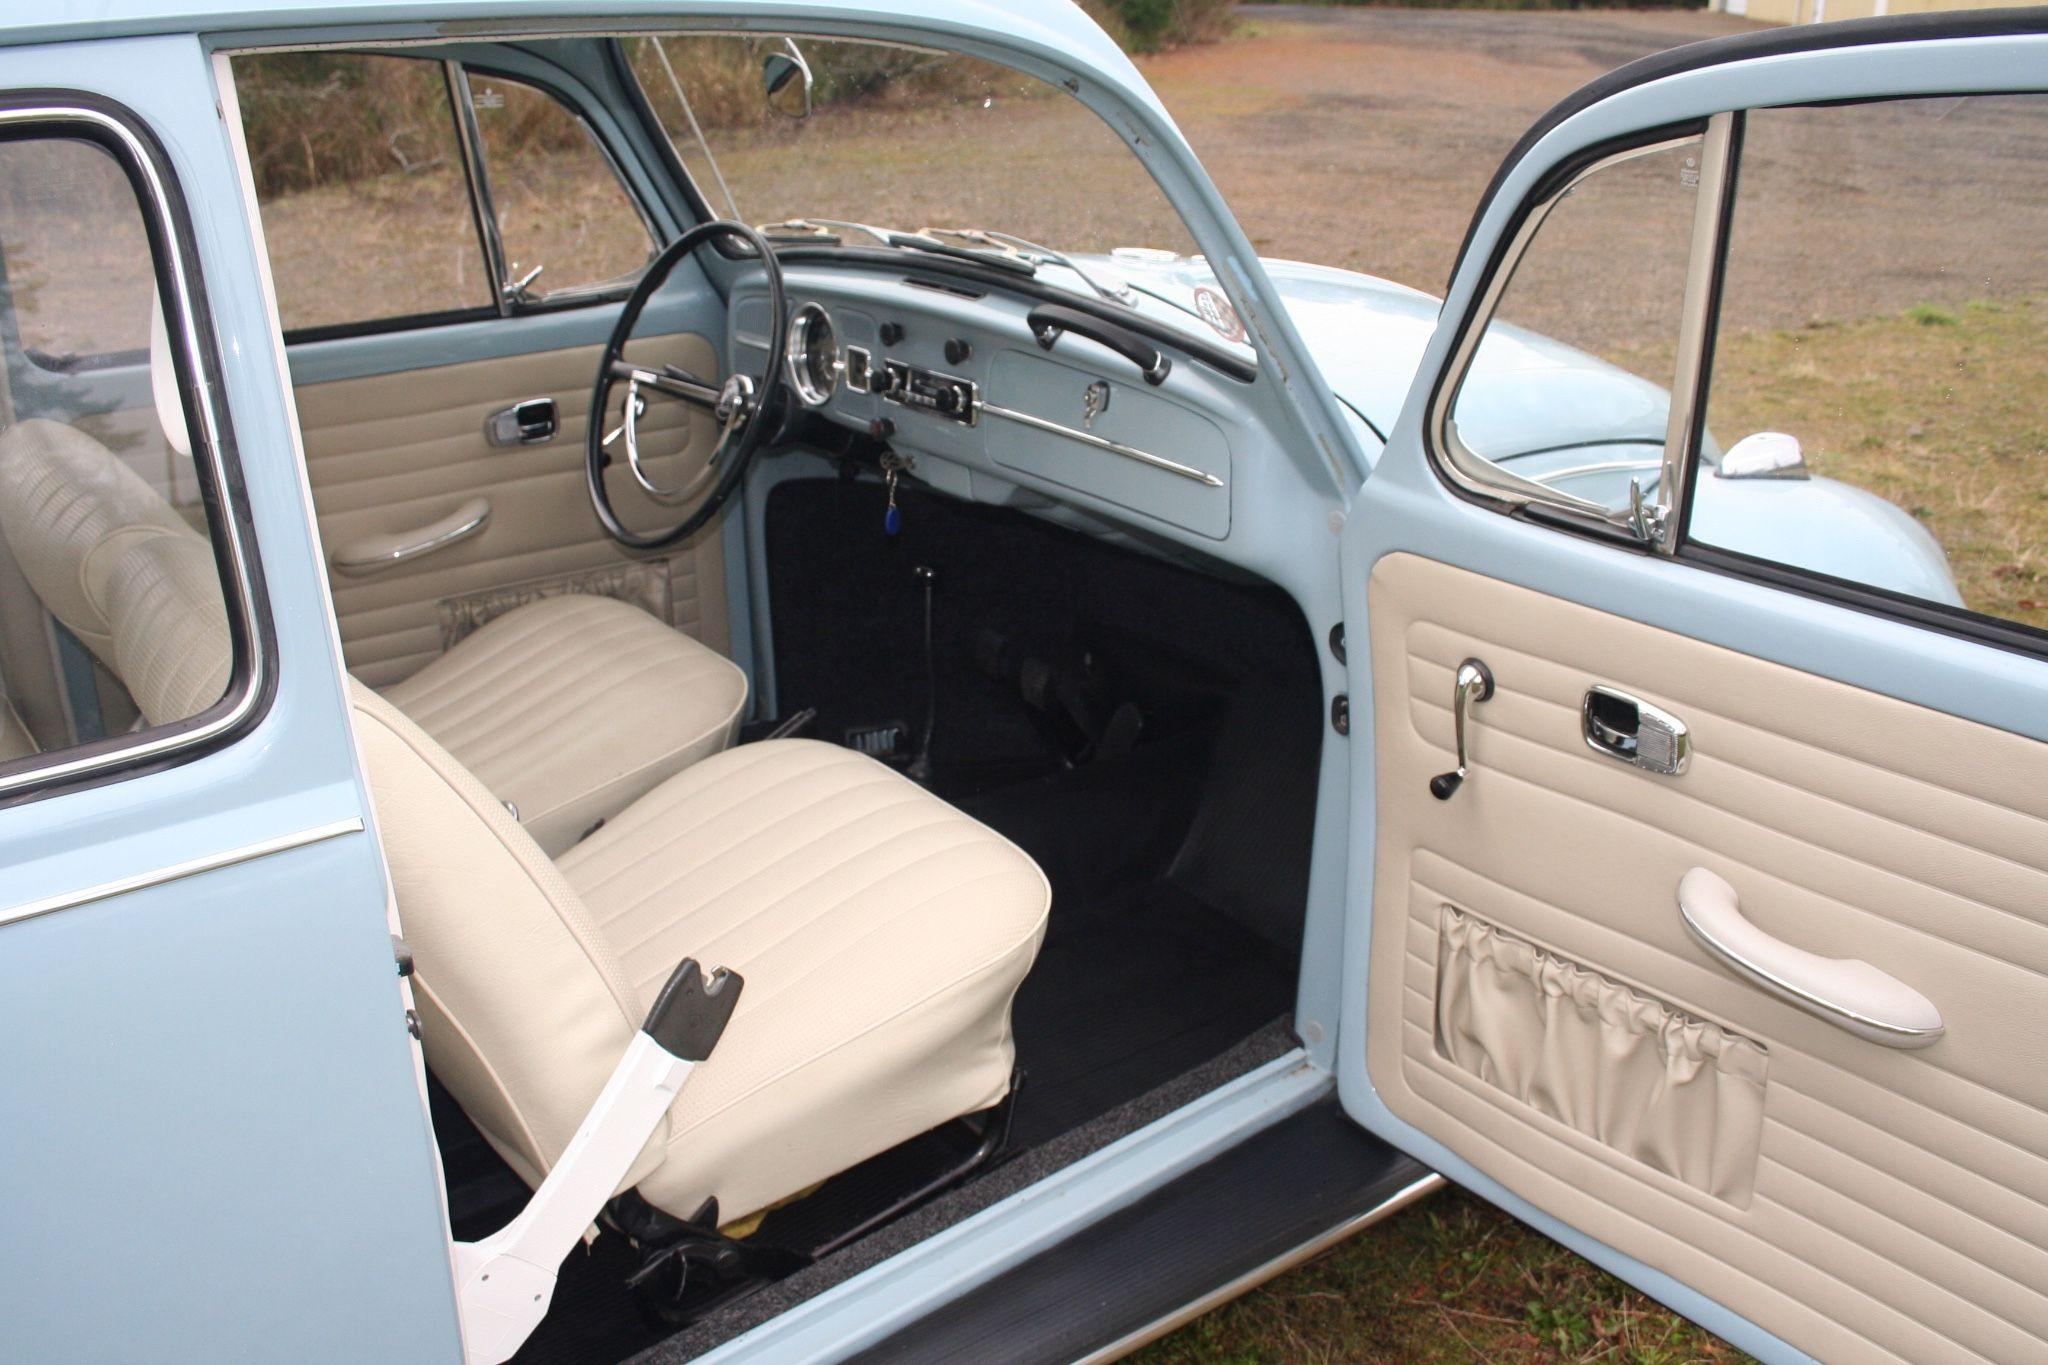 1967 Volkswagen Beetle Volkswagen Beetle Volkswagen Beetle Vintage Vw Beetle Classic